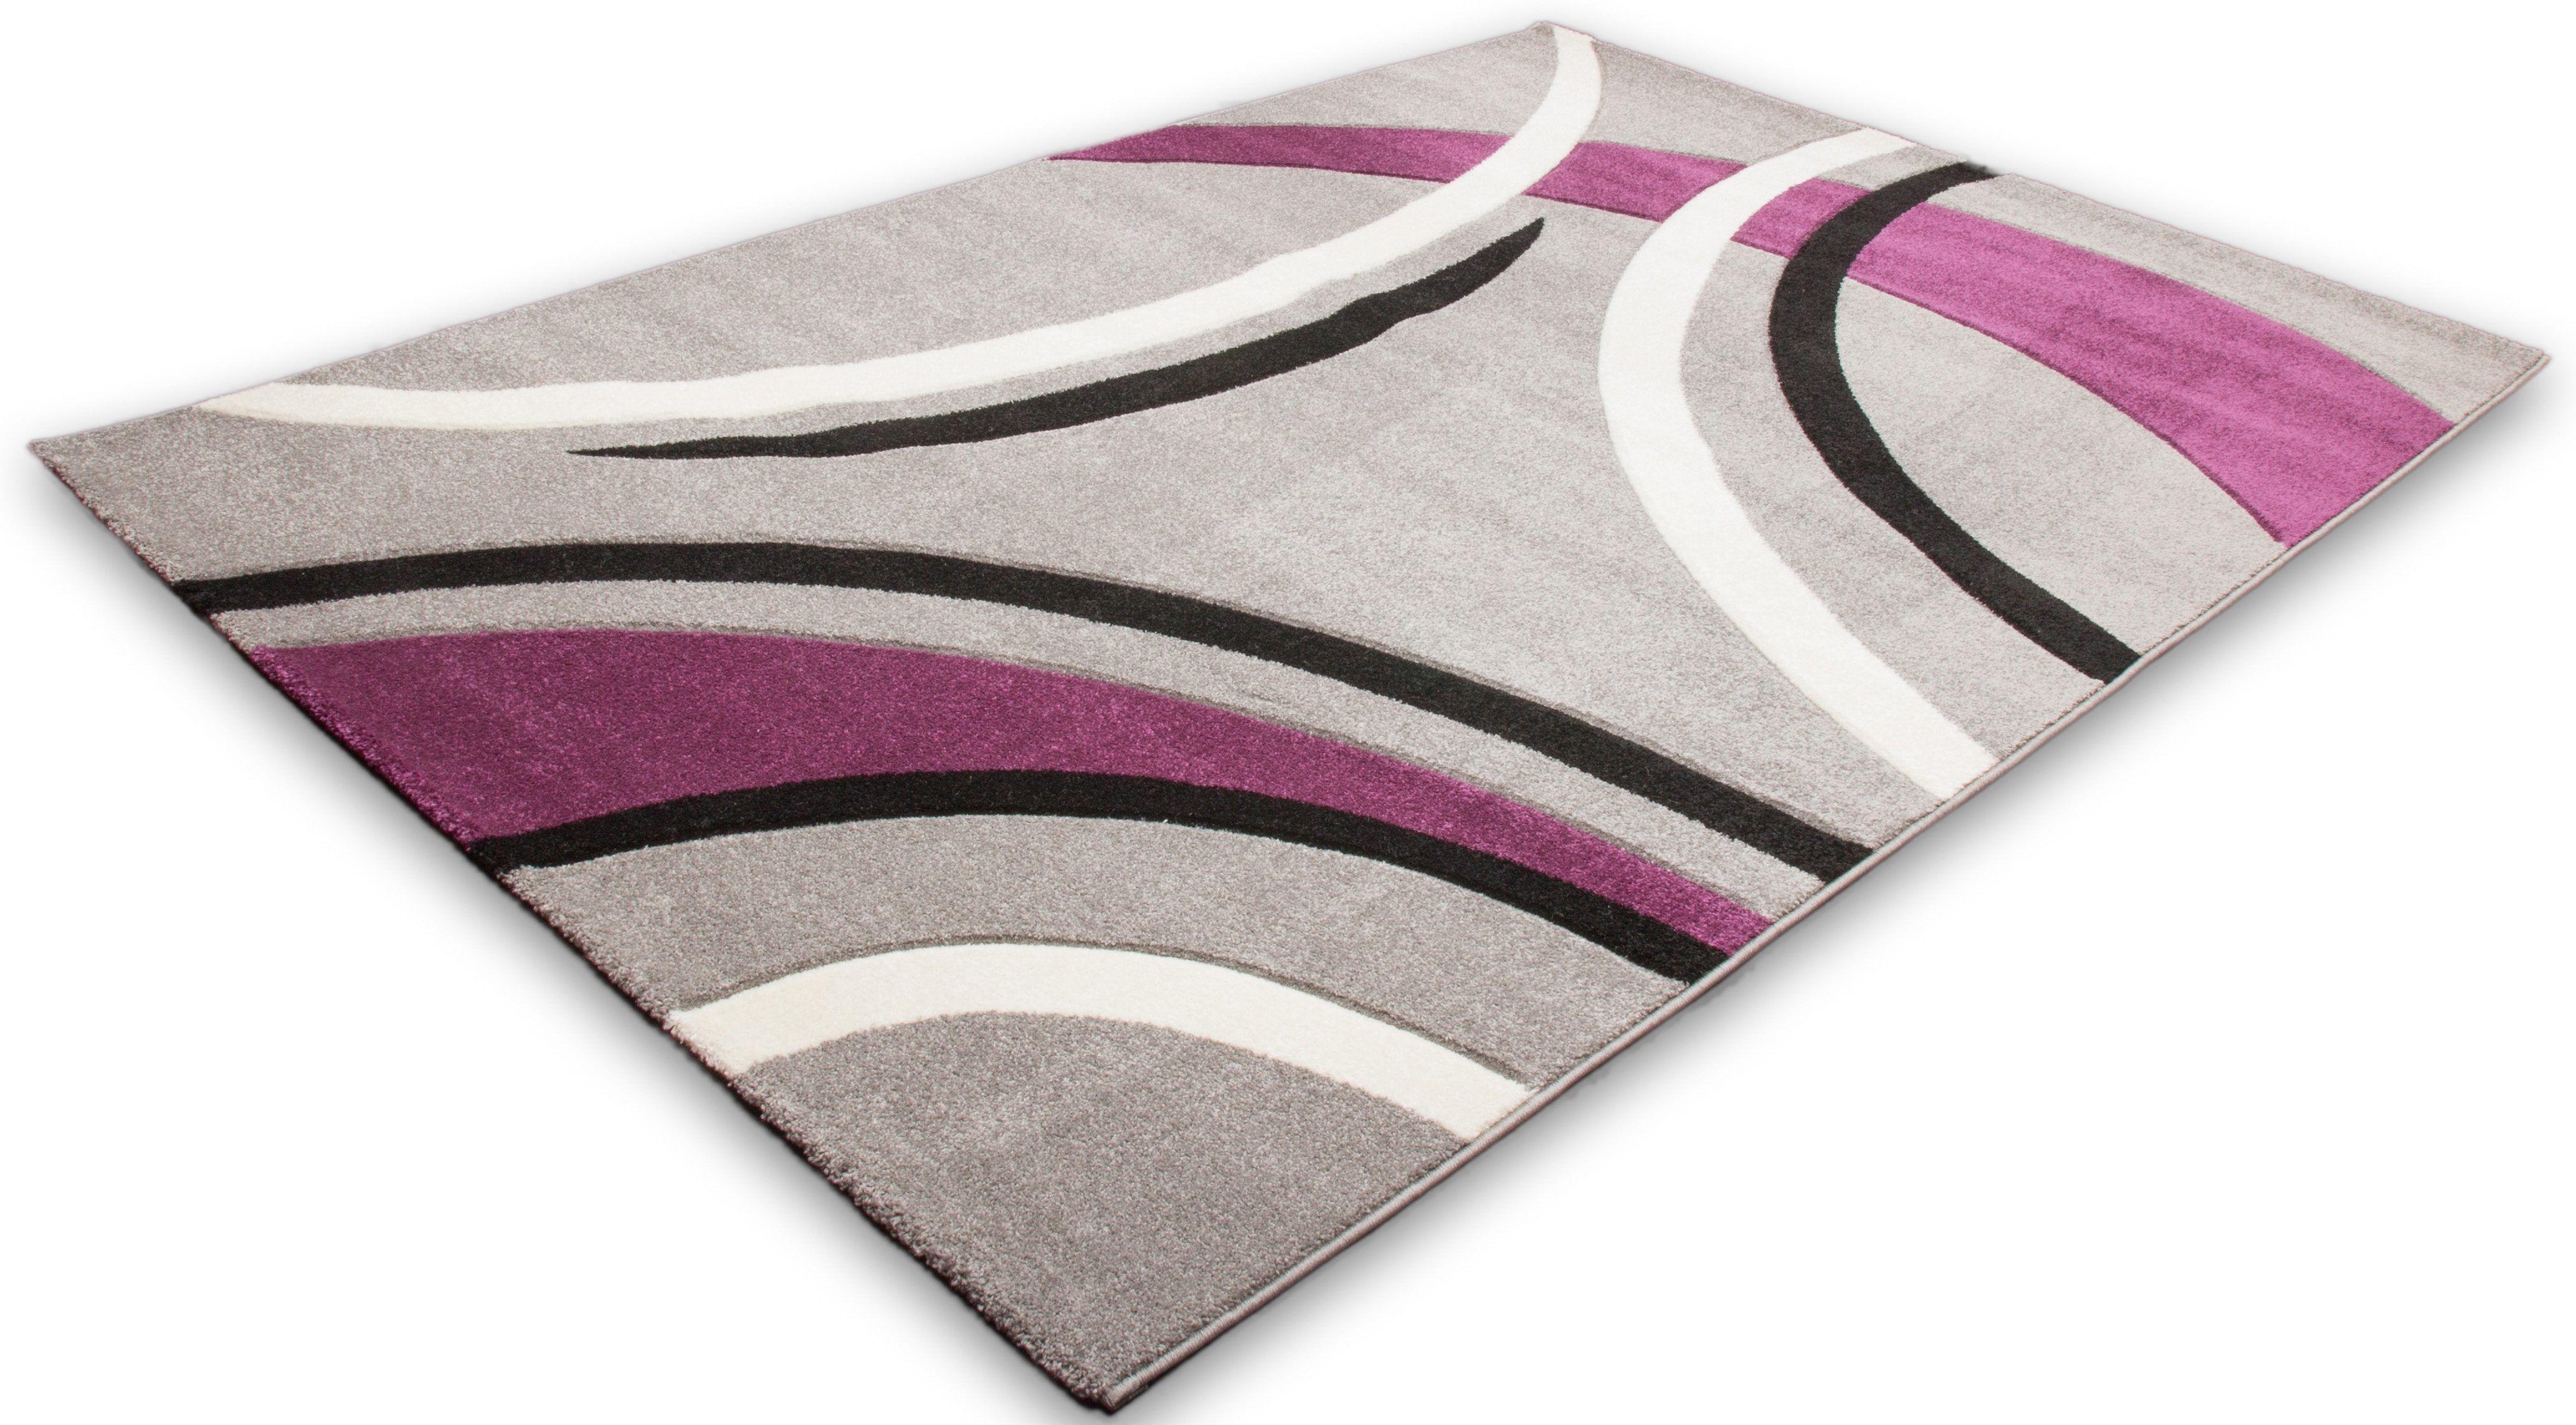 Teppich Lalee Havanna 409 Gewebt Jetzt Bestellen Unter Https Moebel Ladendirekt De Heimtextilien Teppiche Sonst Teppich Teppich Online Kaufen Textilien